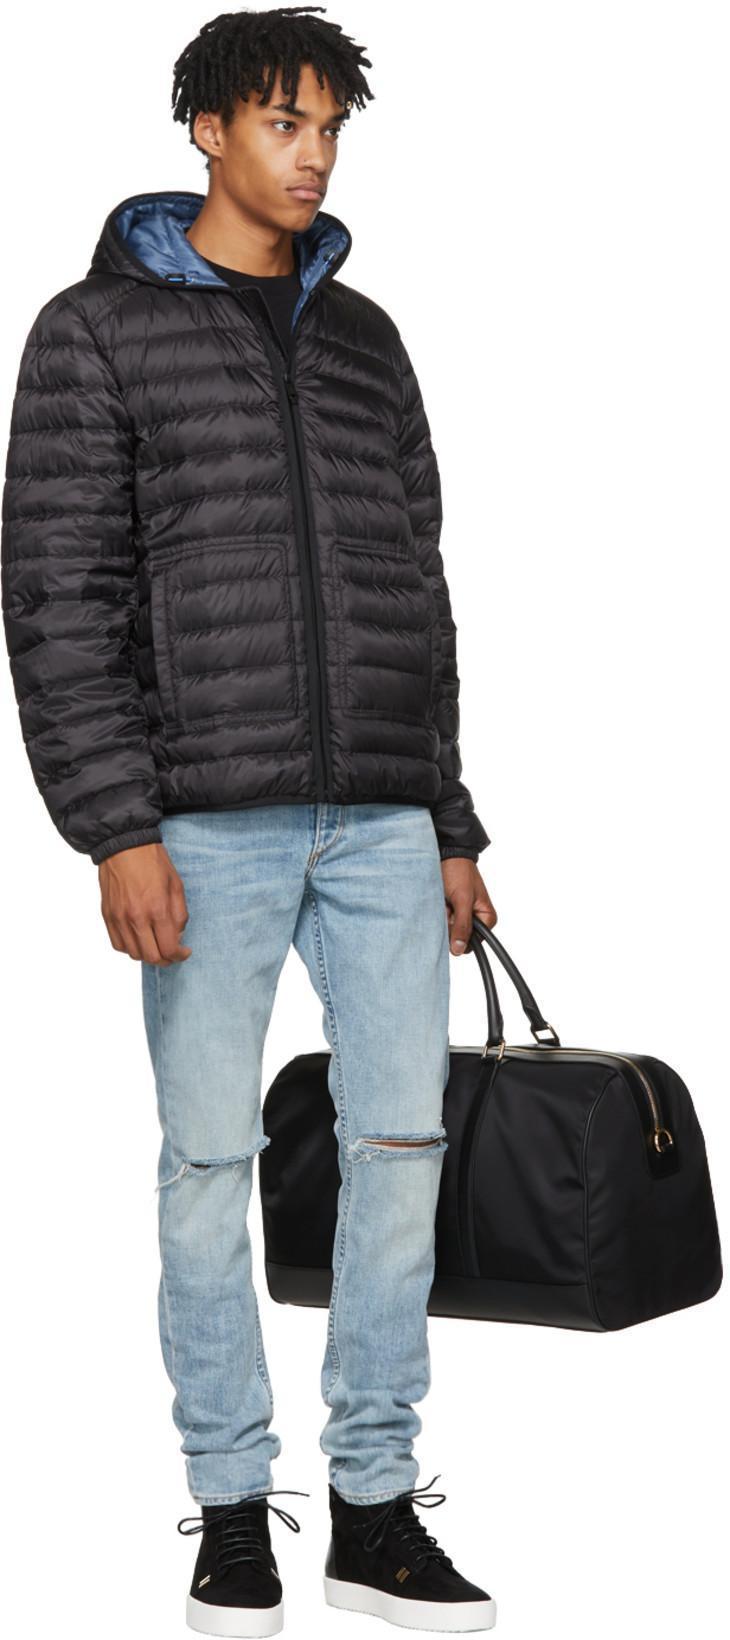 e3b6c7c469 Dolce   Gabbana Black Nylon Duffle Bag